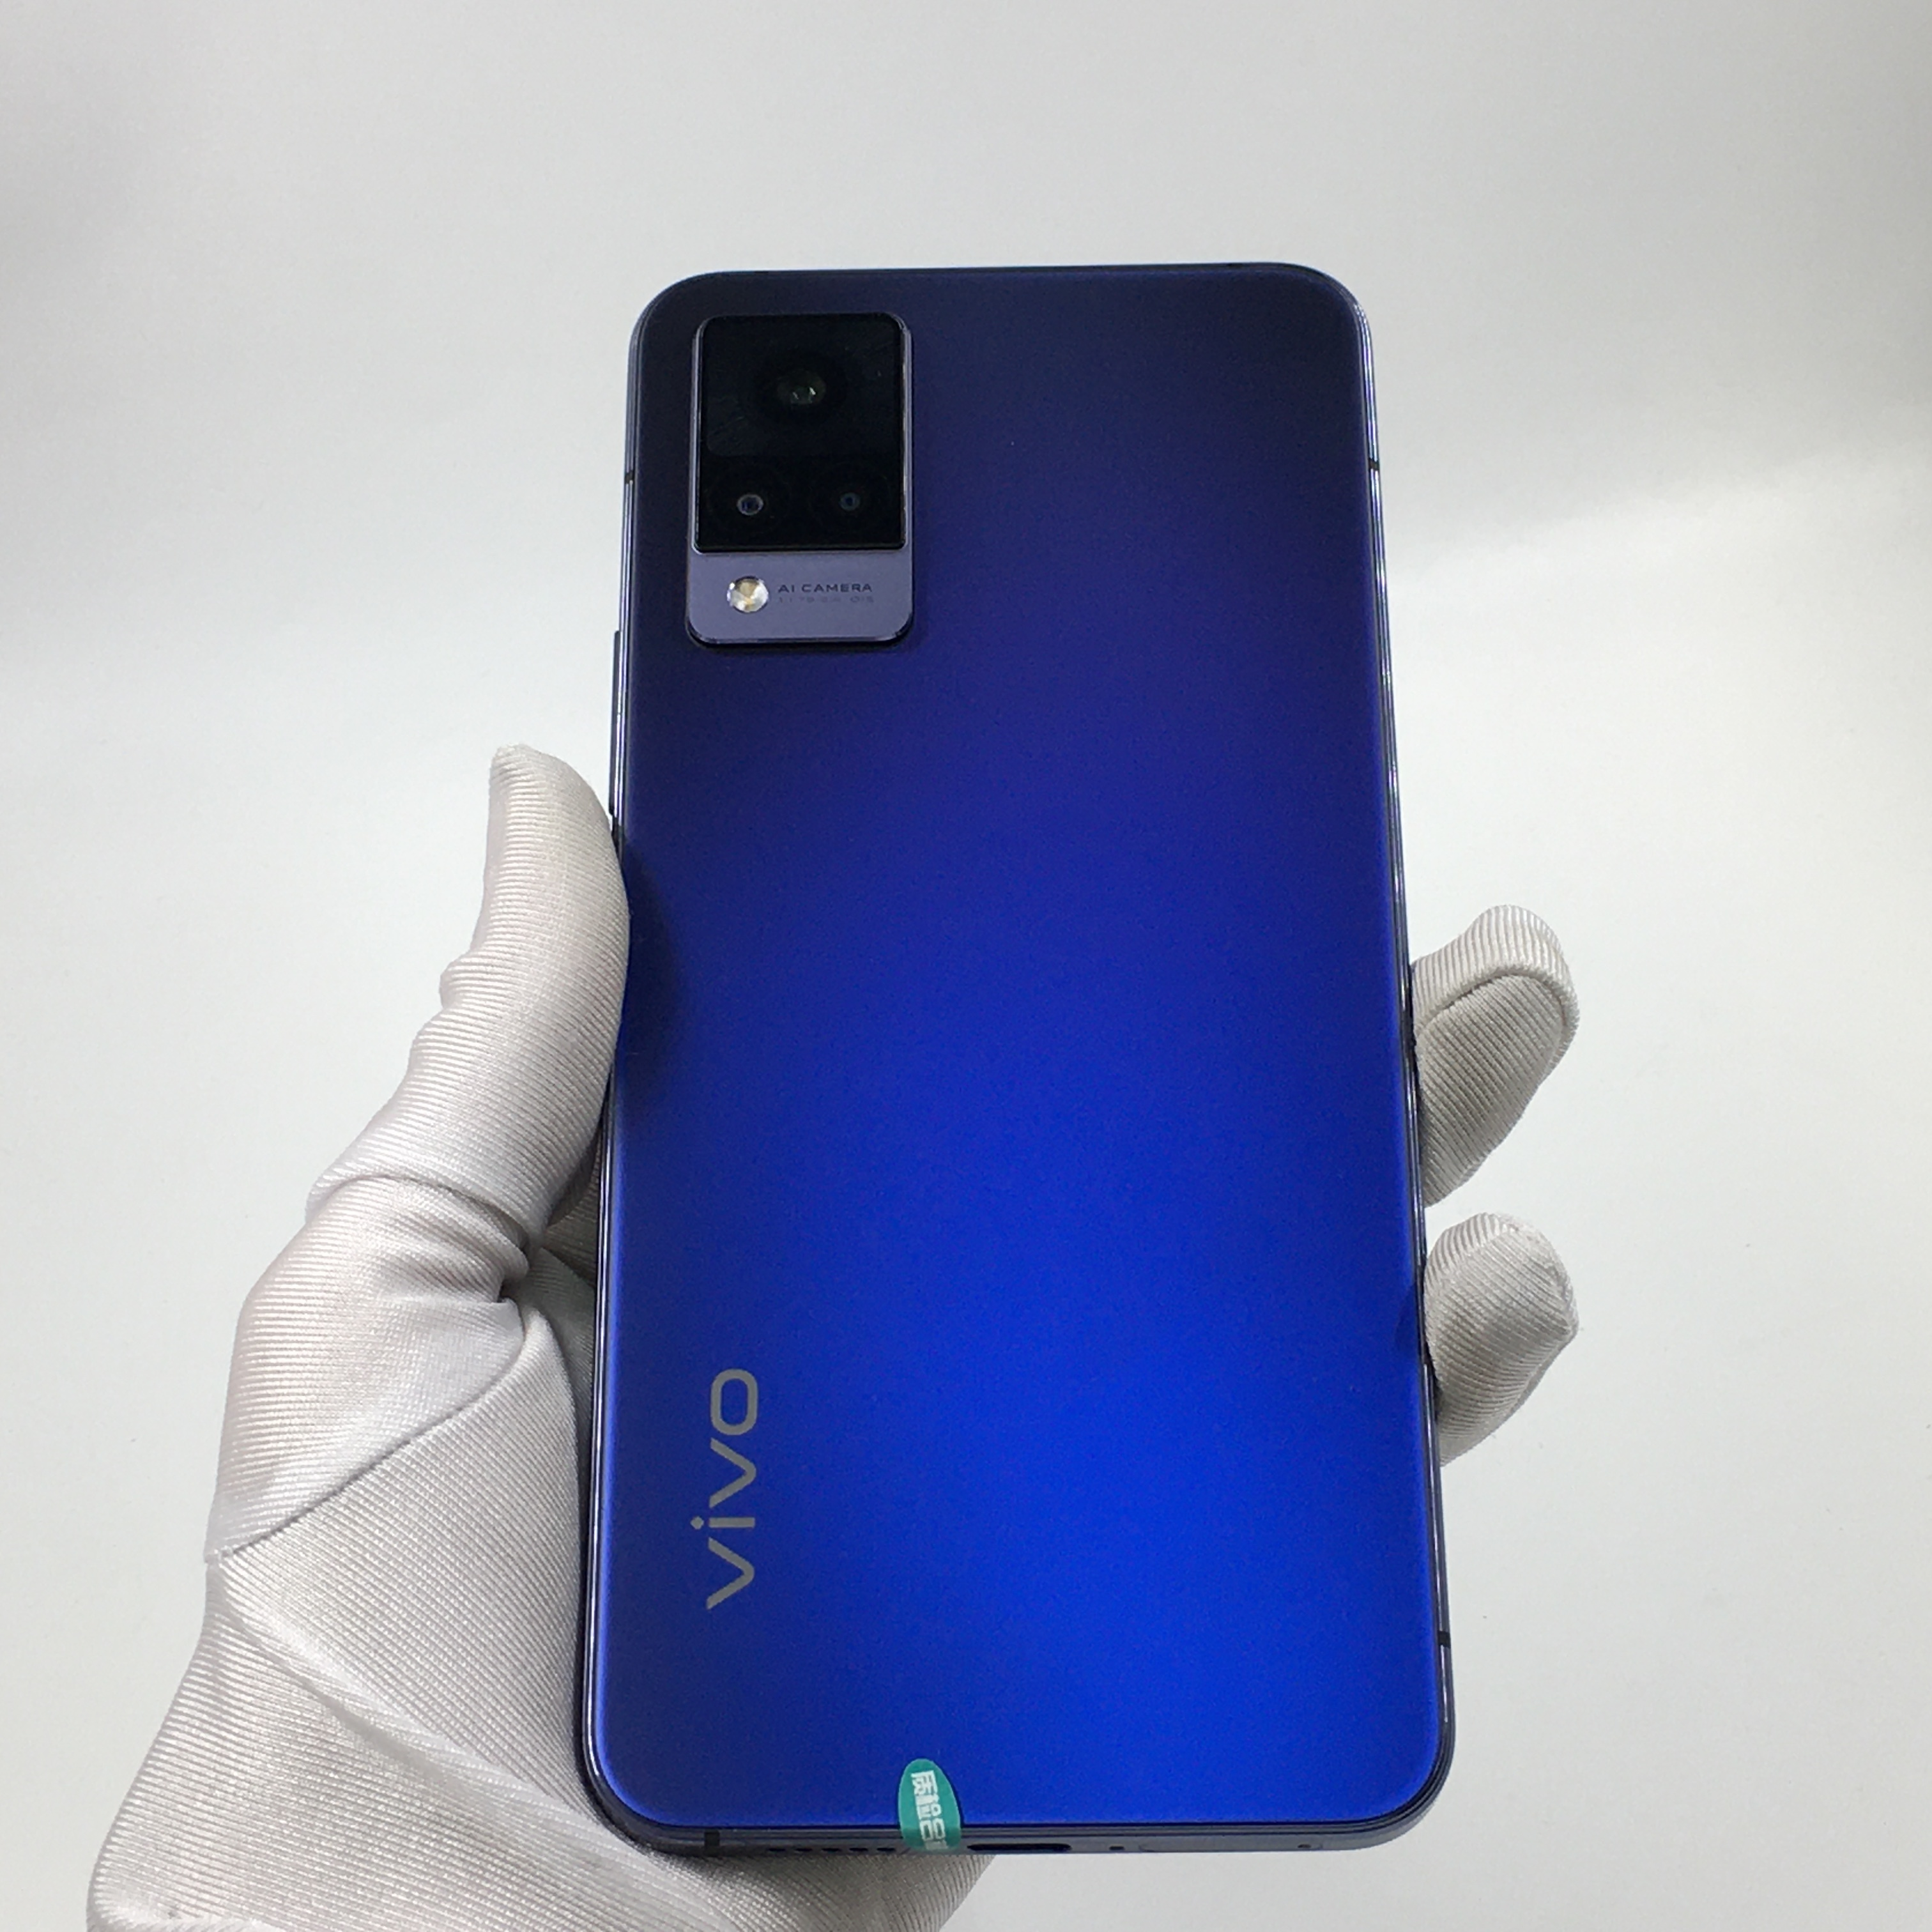 vivo【S9 5G】5G全网通 子夜蓝 8G/128G 国行 95新 8G/128G真机实拍全套原装配件